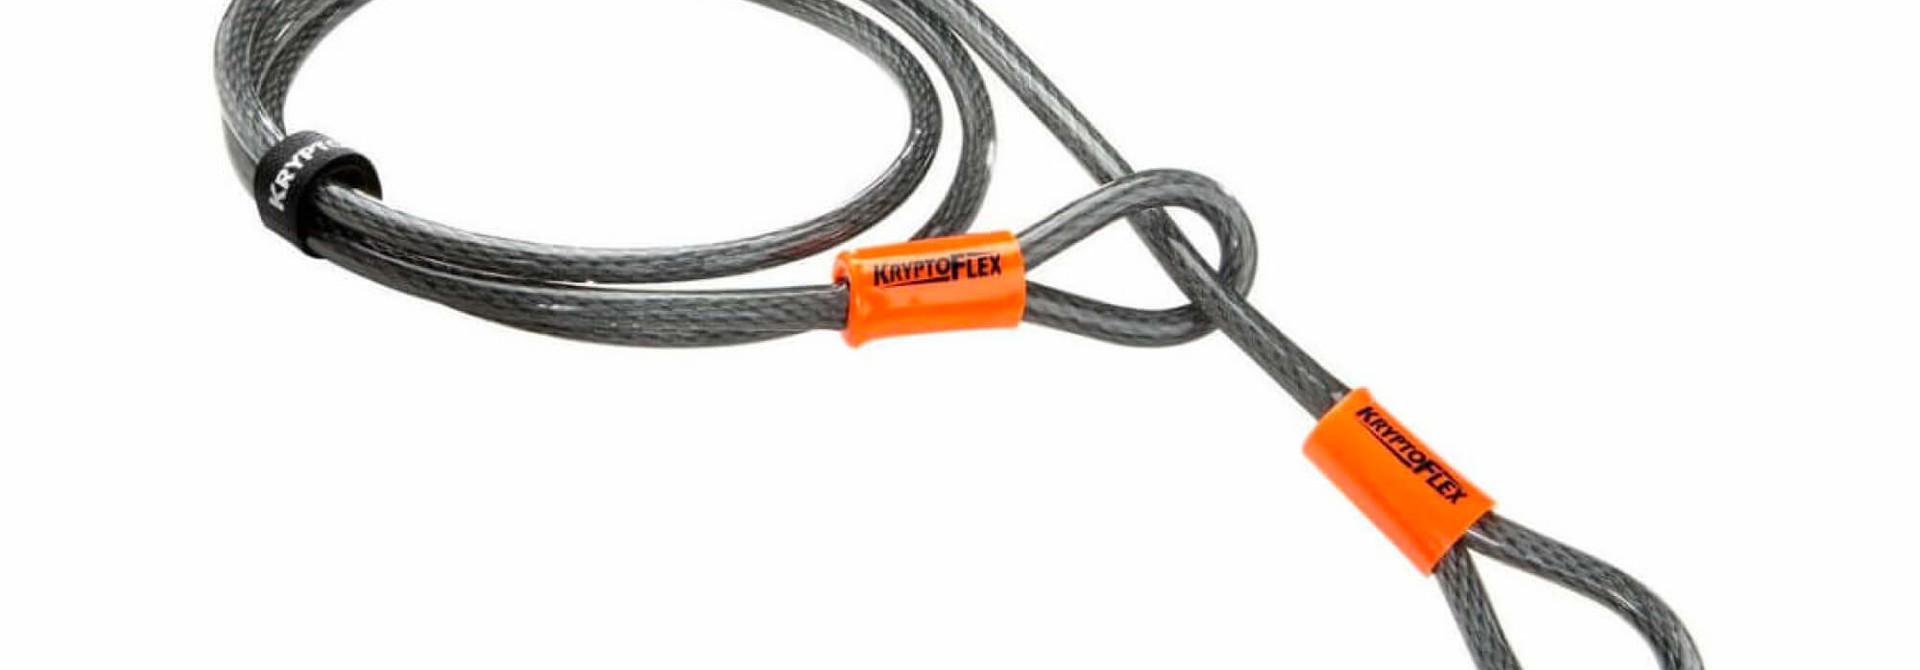 Kryptoflex 1007 Looped Cable 220cm X 10mm